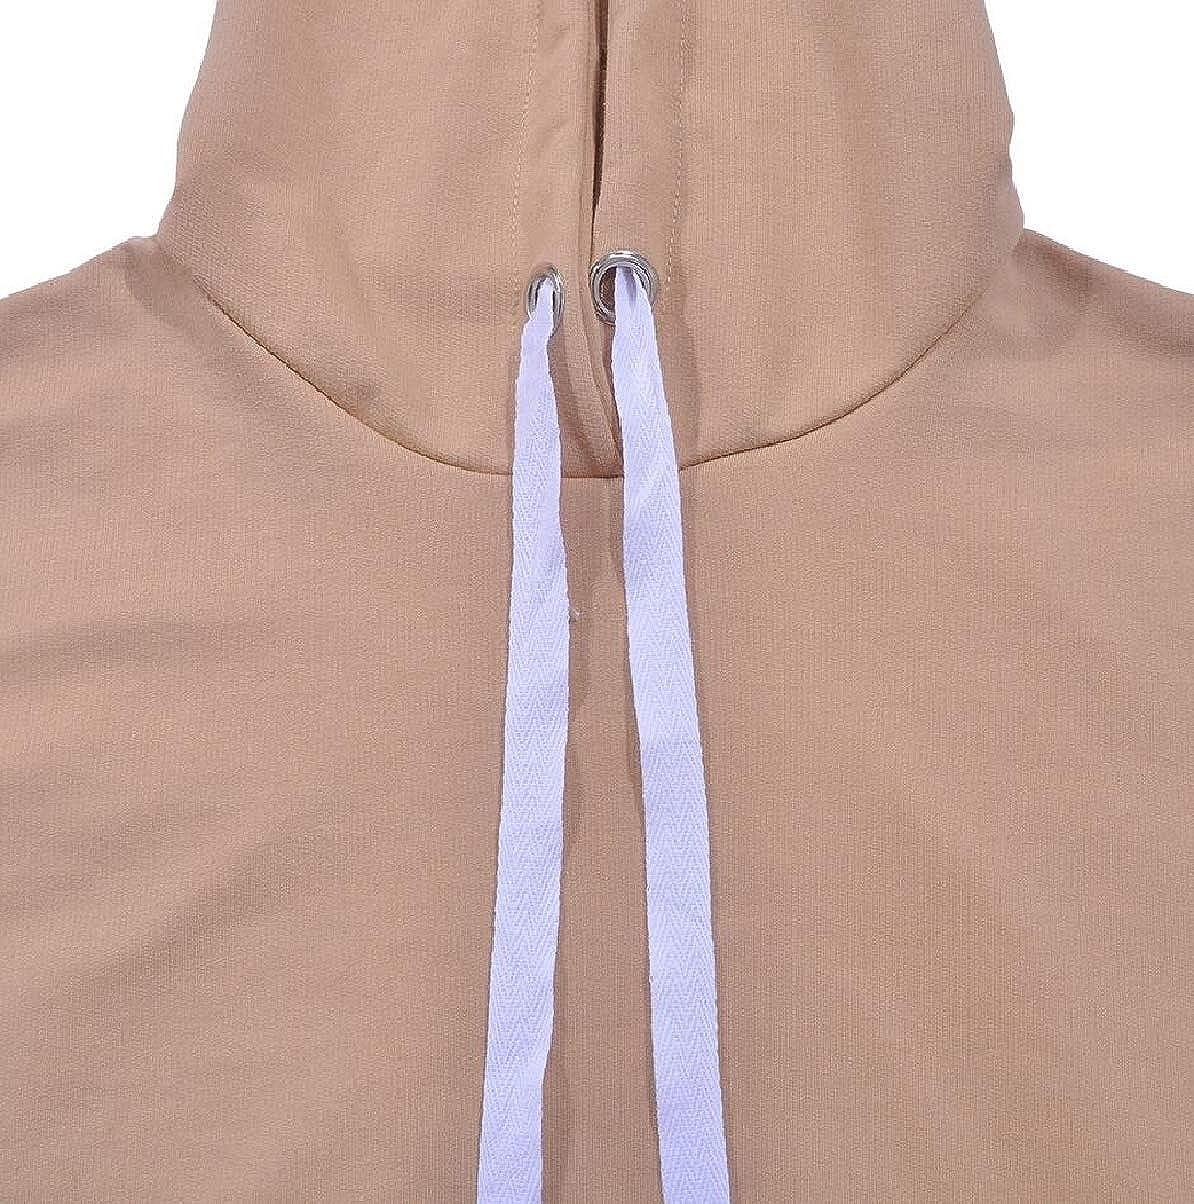 ZXFHZS Womens Loose Hoodies Long Side Slit Casual Pullover Sweatshirts